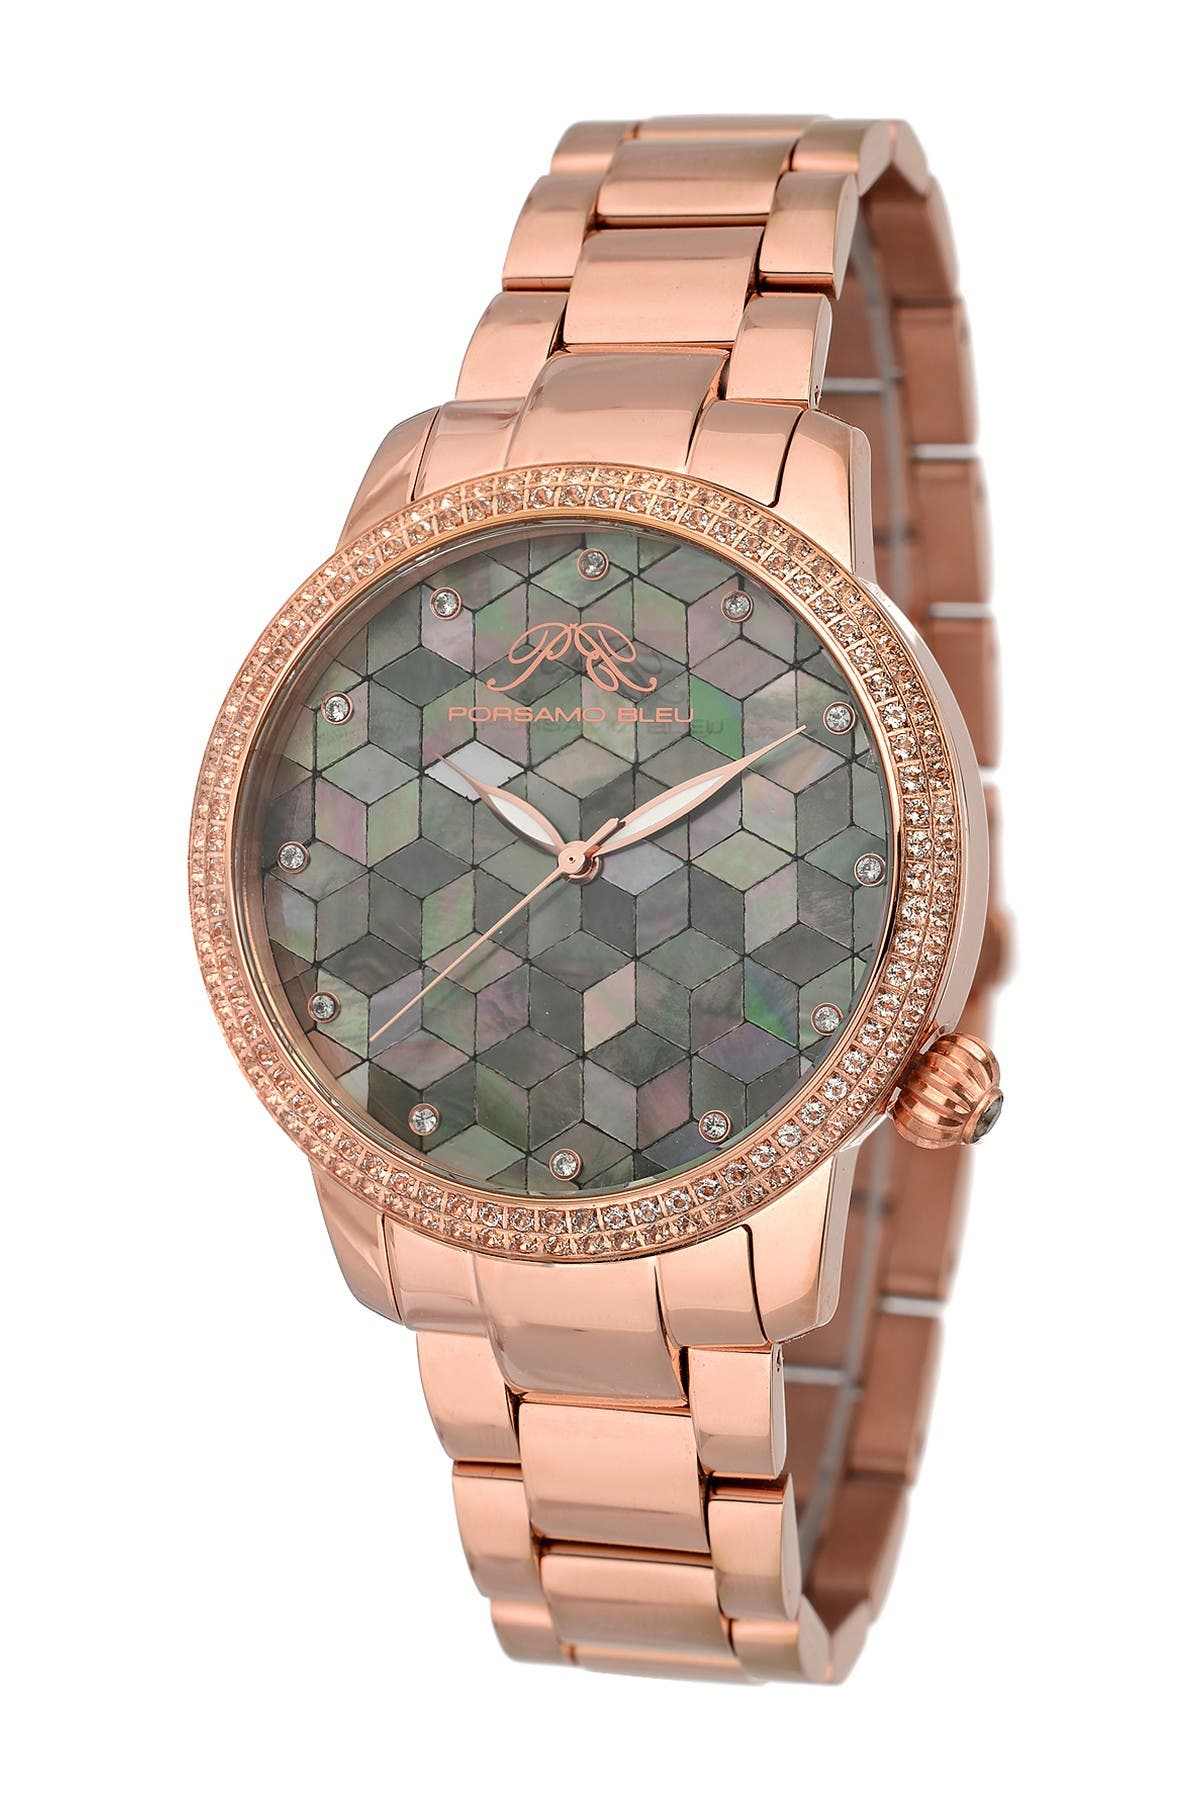 Image of Porsamo Bleu Women's Evelyn Topaz Stone Quartz Watch, 38mm